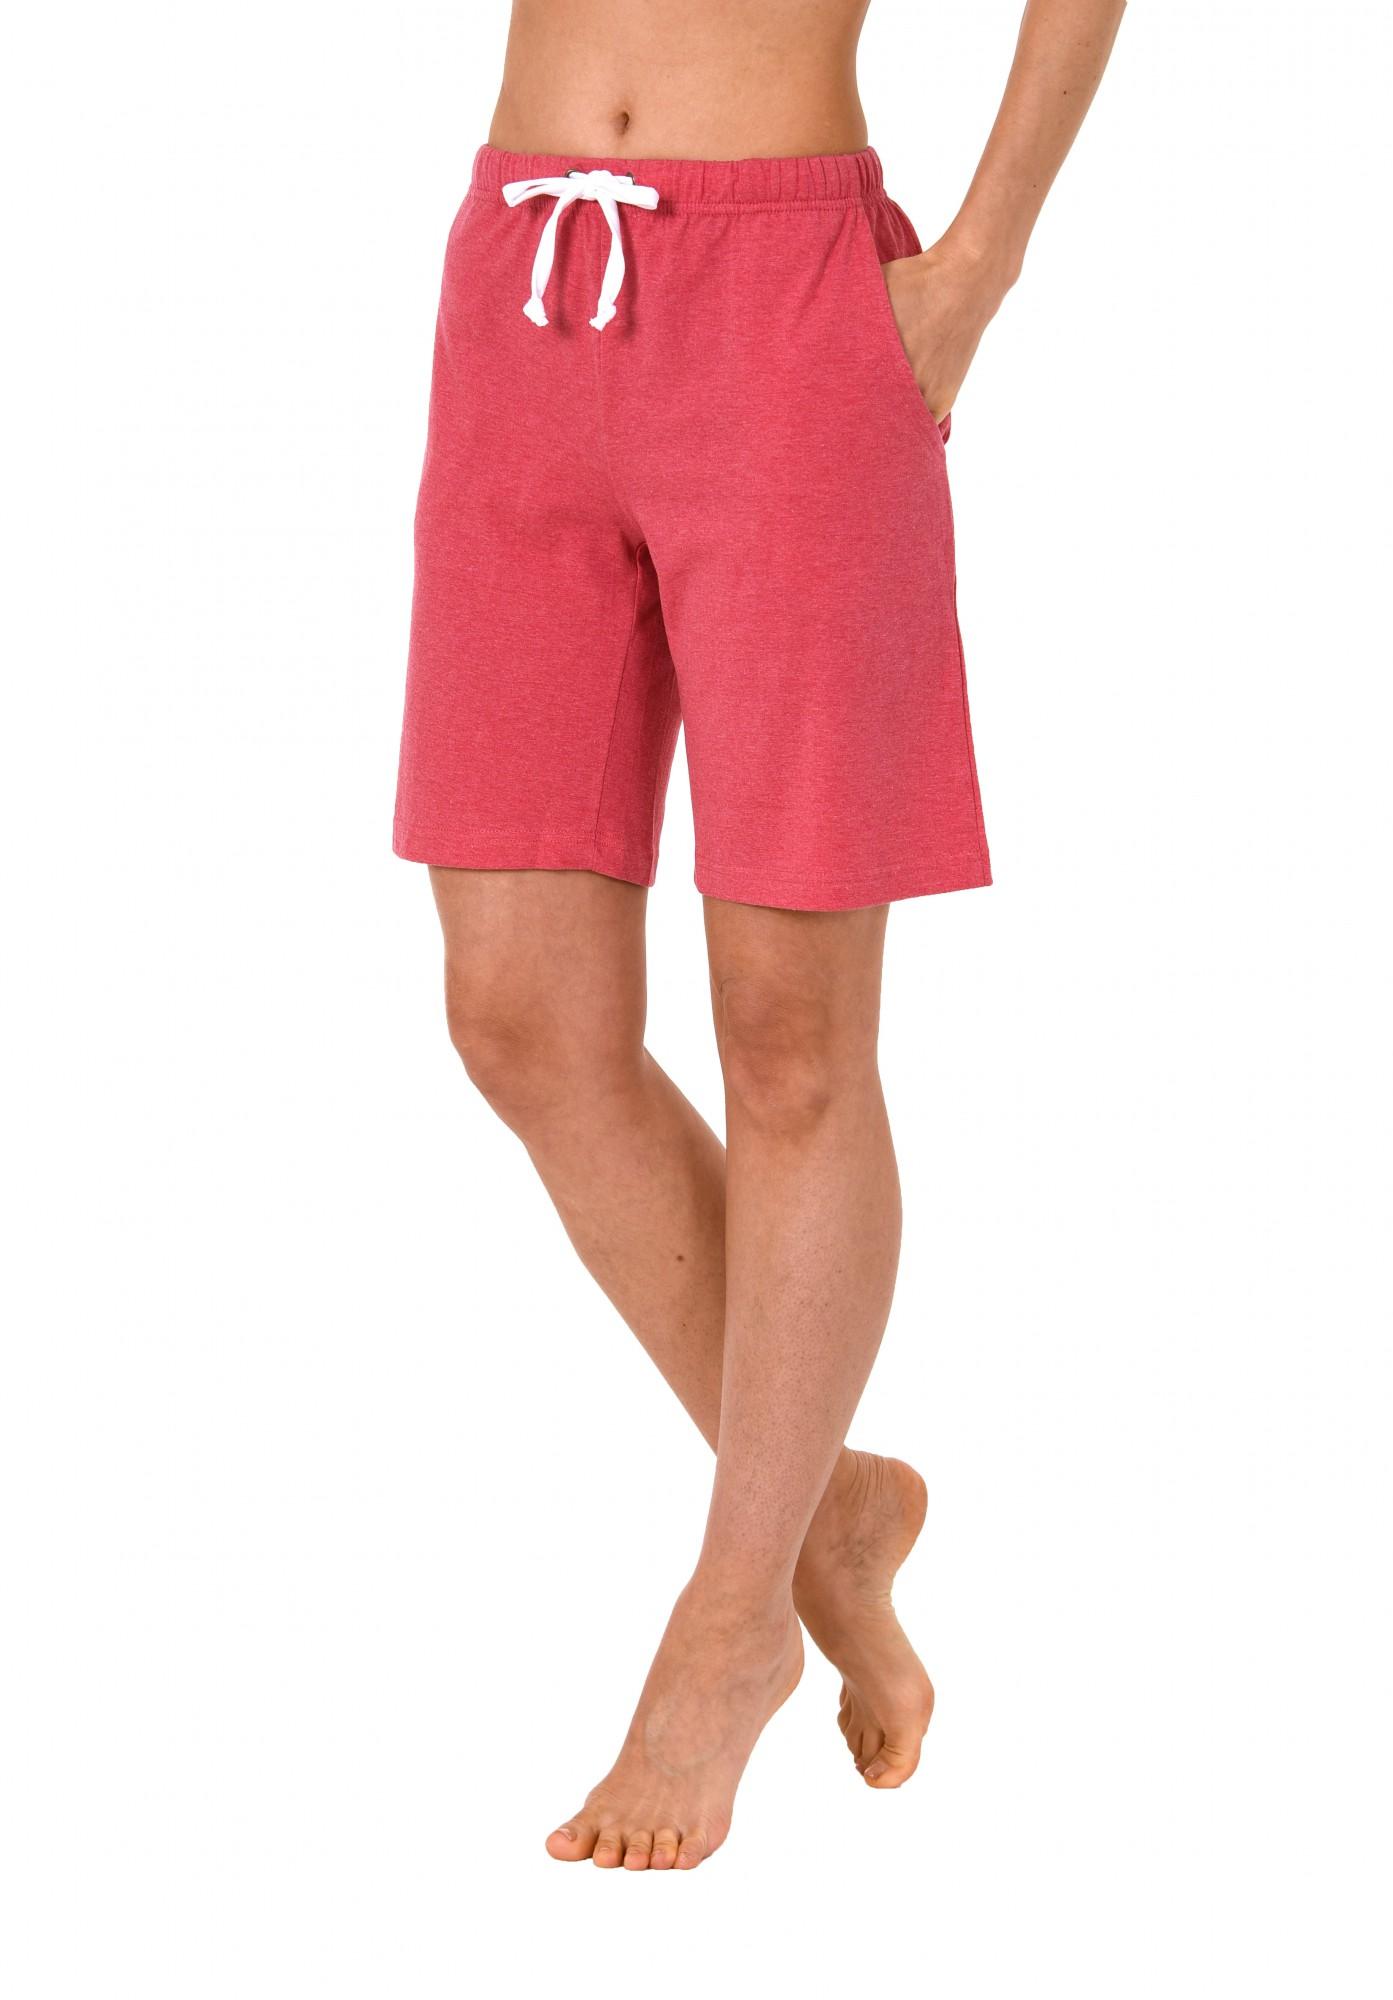 Damen Pyjama Bermuda kurze Hose  - Mix & Match - ideal zum kombinieren  224 90 902 – Bild 7